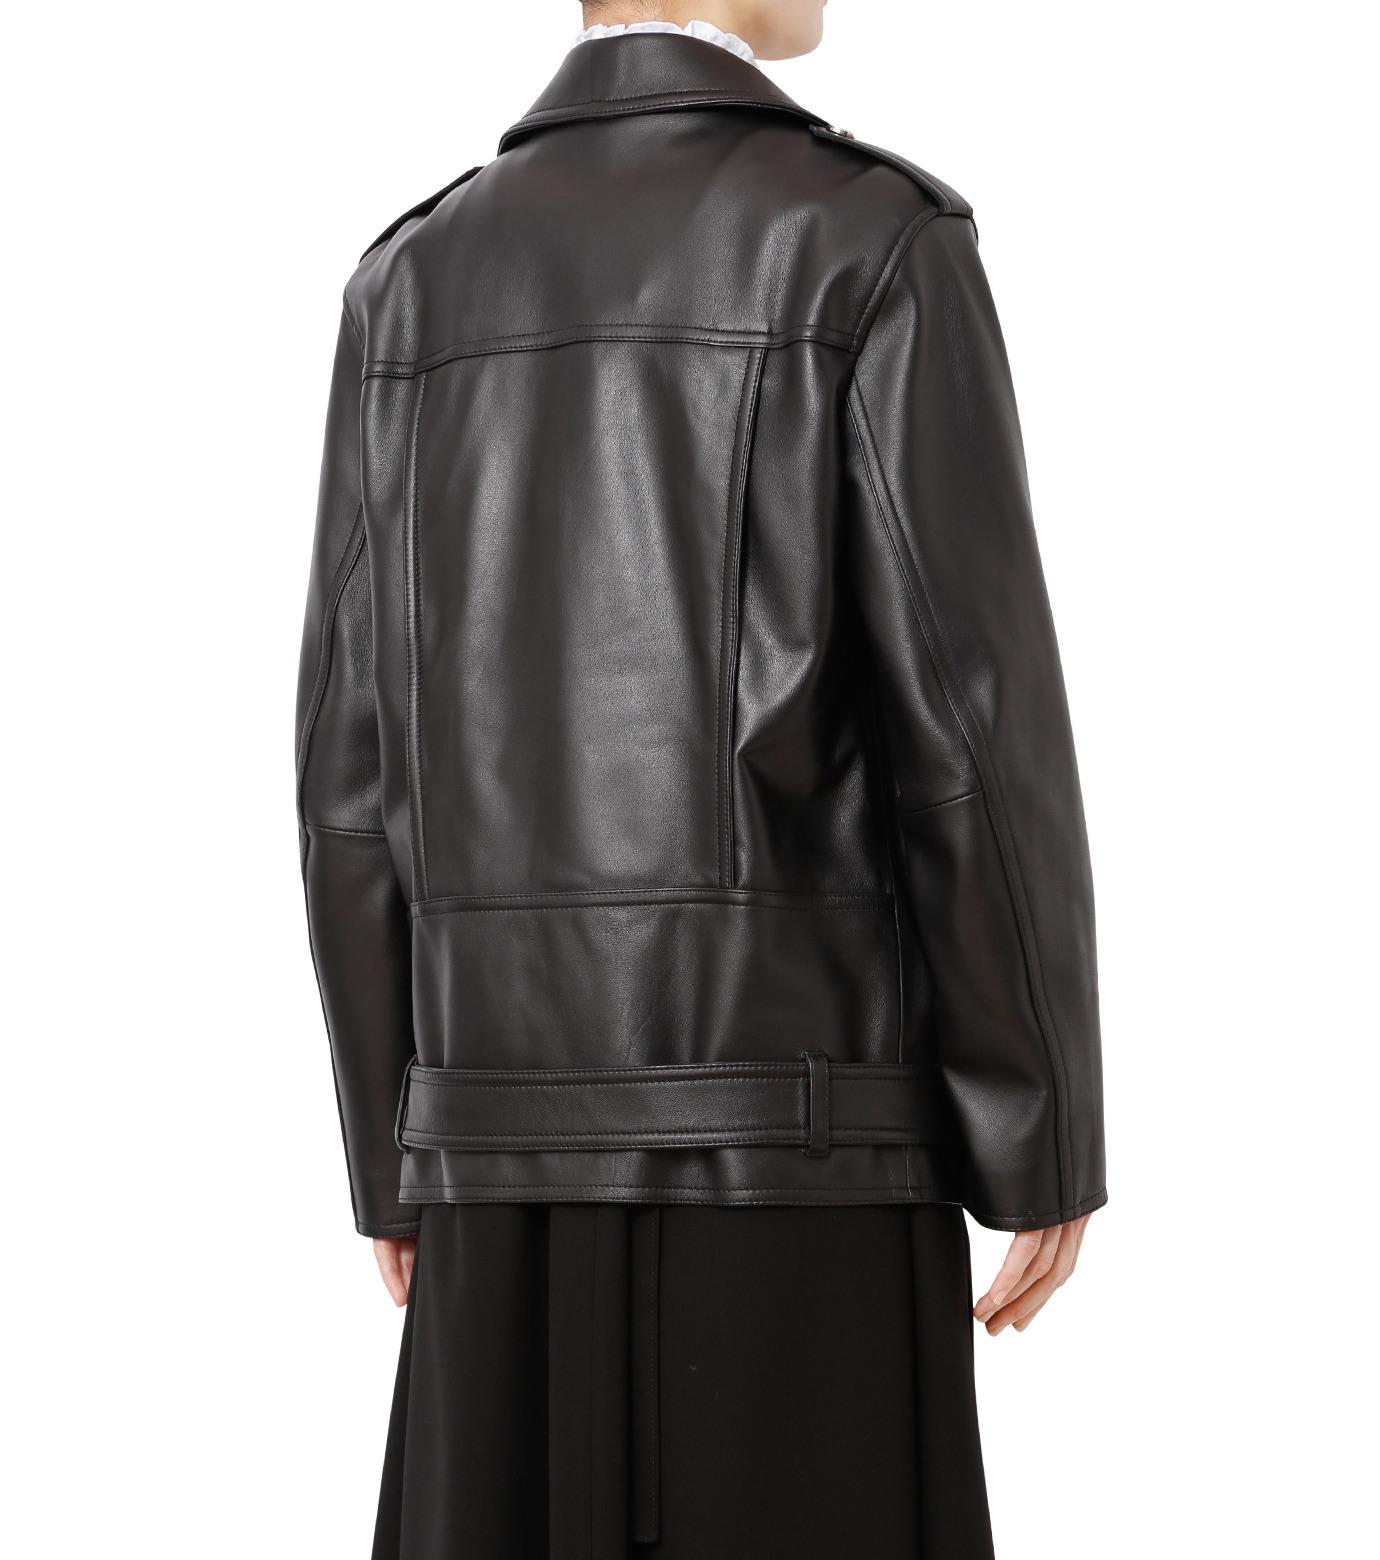 LE CIEL BLEU(ルシェルブルー)のレザーライダースジャケット-BLACK(ジャケット/jacket)-18A64004 拡大詳細画像2